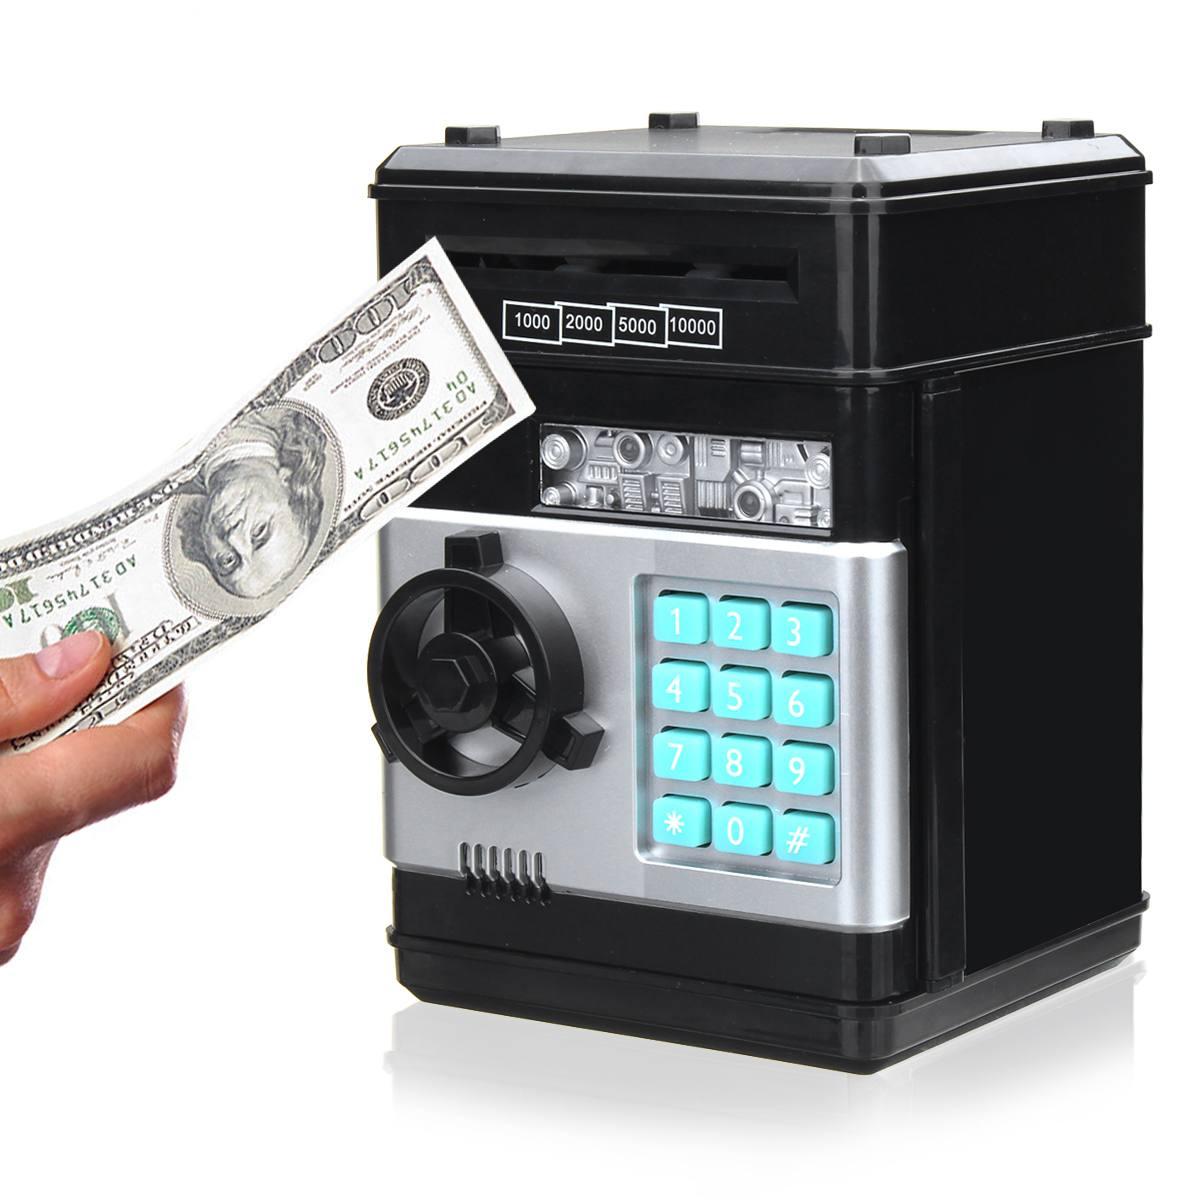 KIWarm Electronic Password Money Box Code Key Lock Automatic Coins Cash Saving Money Box Counter Mini Safe Box Child Gift